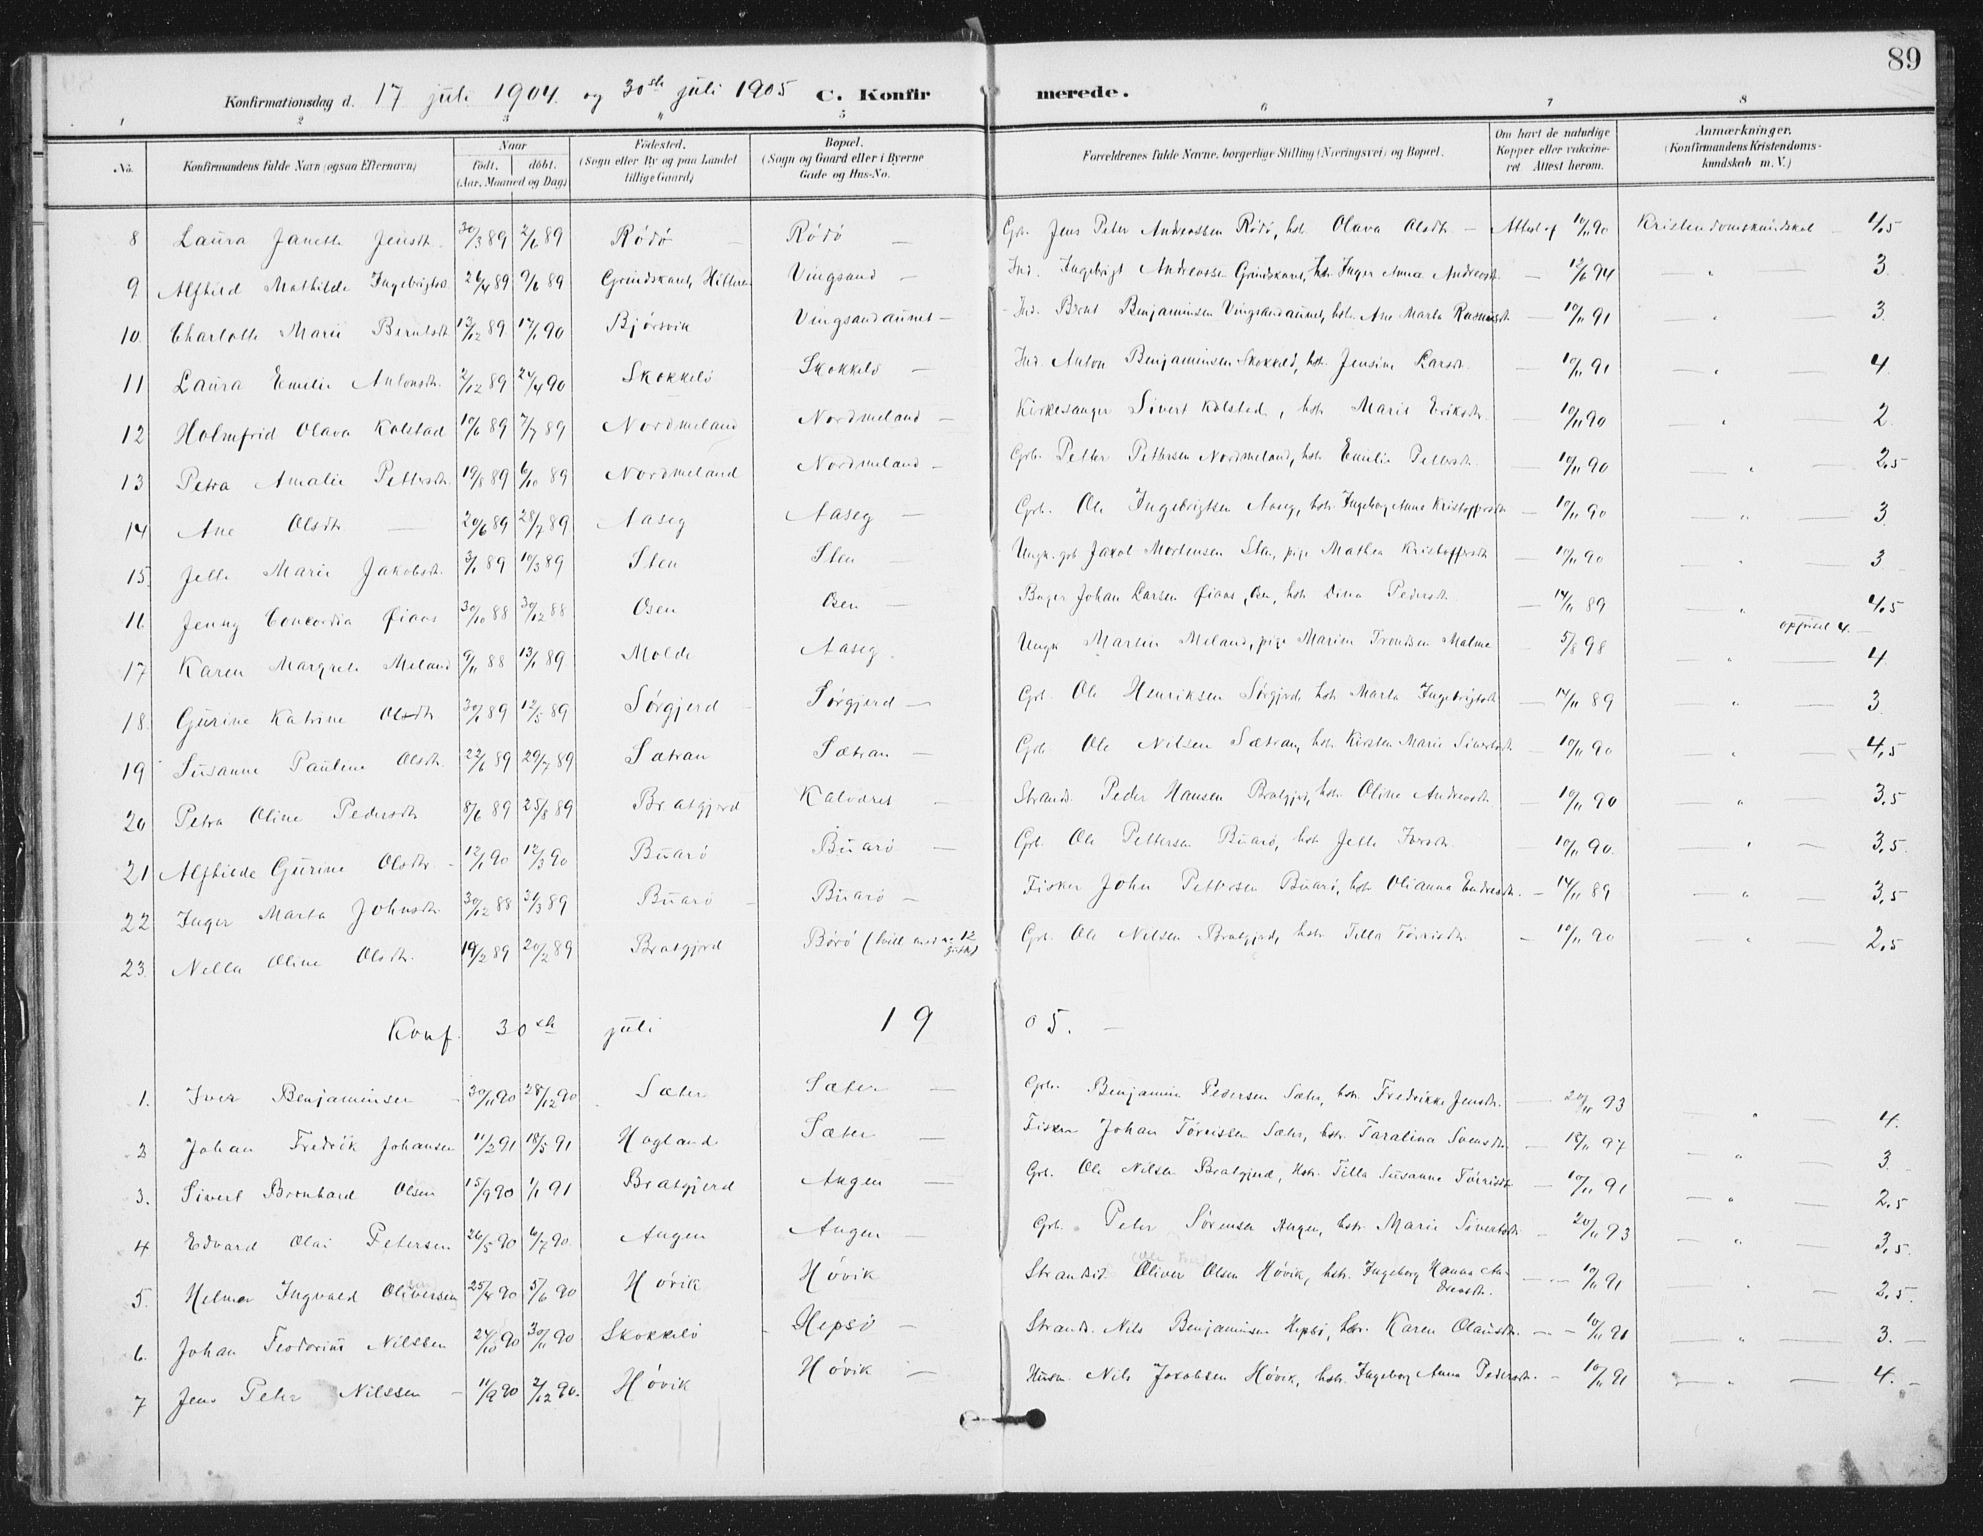 SAT, Ministerialprotokoller, klokkerbøker og fødselsregistre - Sør-Trøndelag, 658/L0723: Parish register (official) no. 658A02, 1897-1912, p. 89